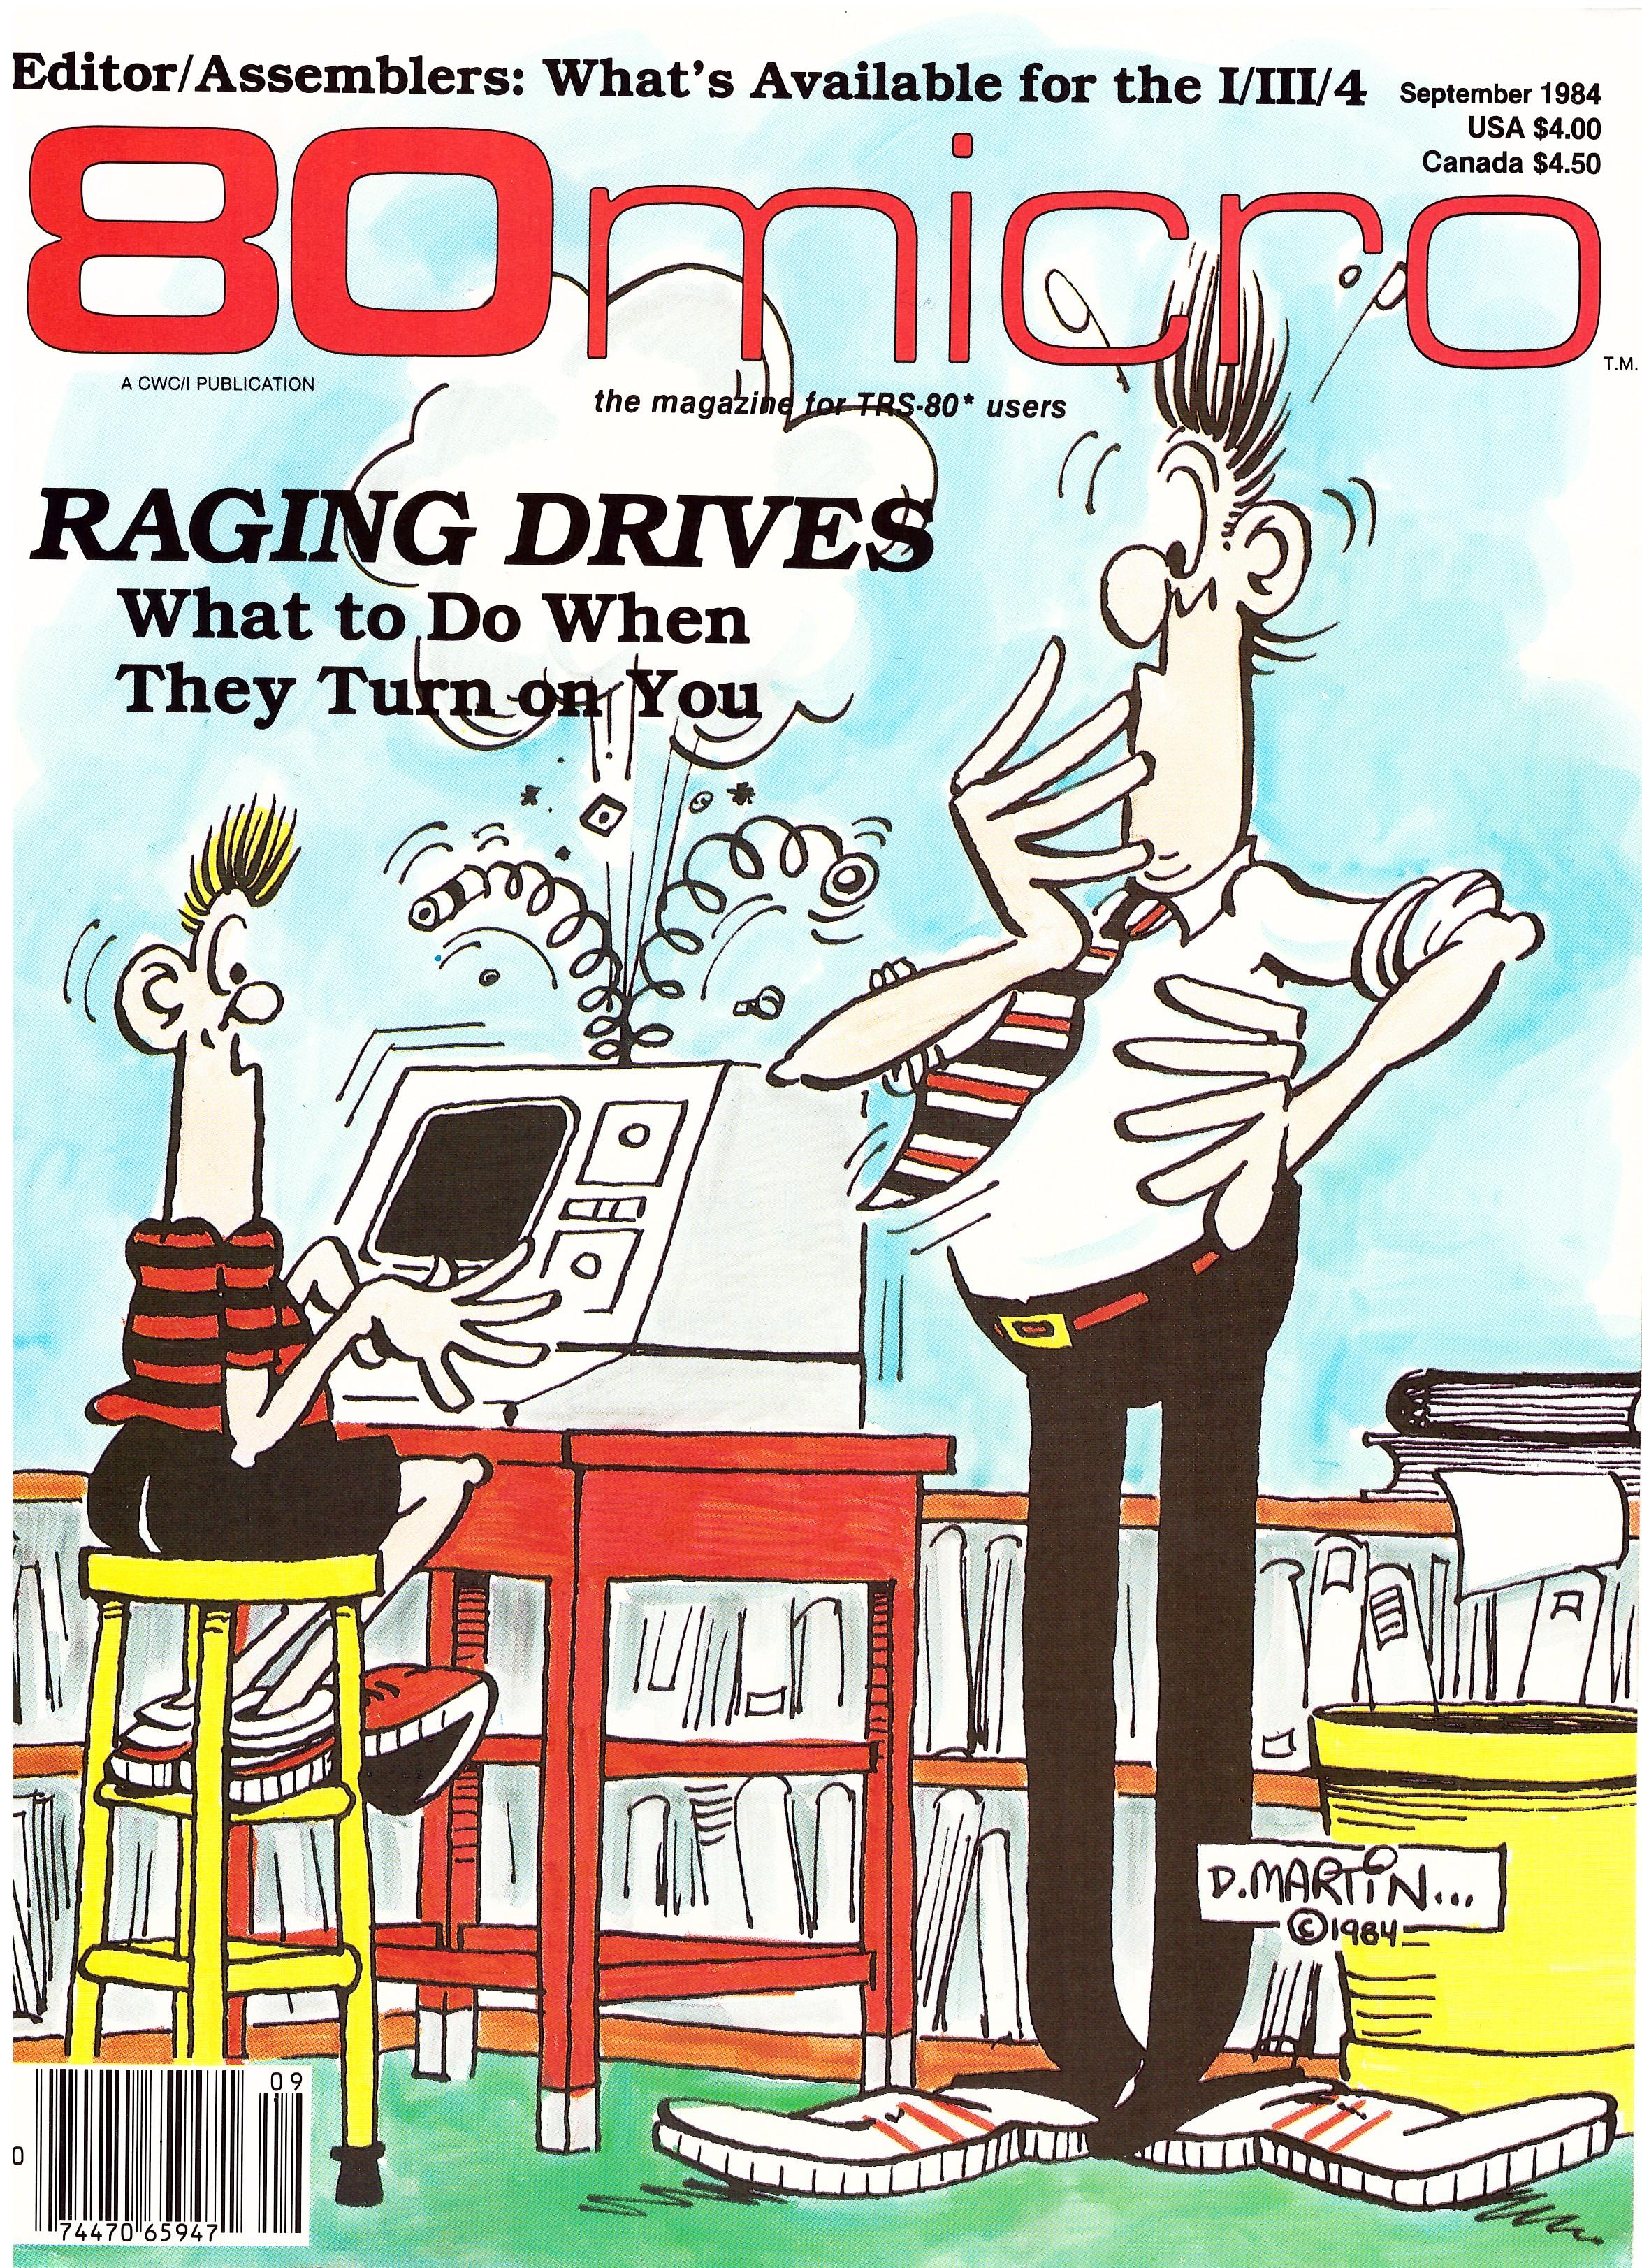 80 micro Magazine with Don Martin Artwork • USA